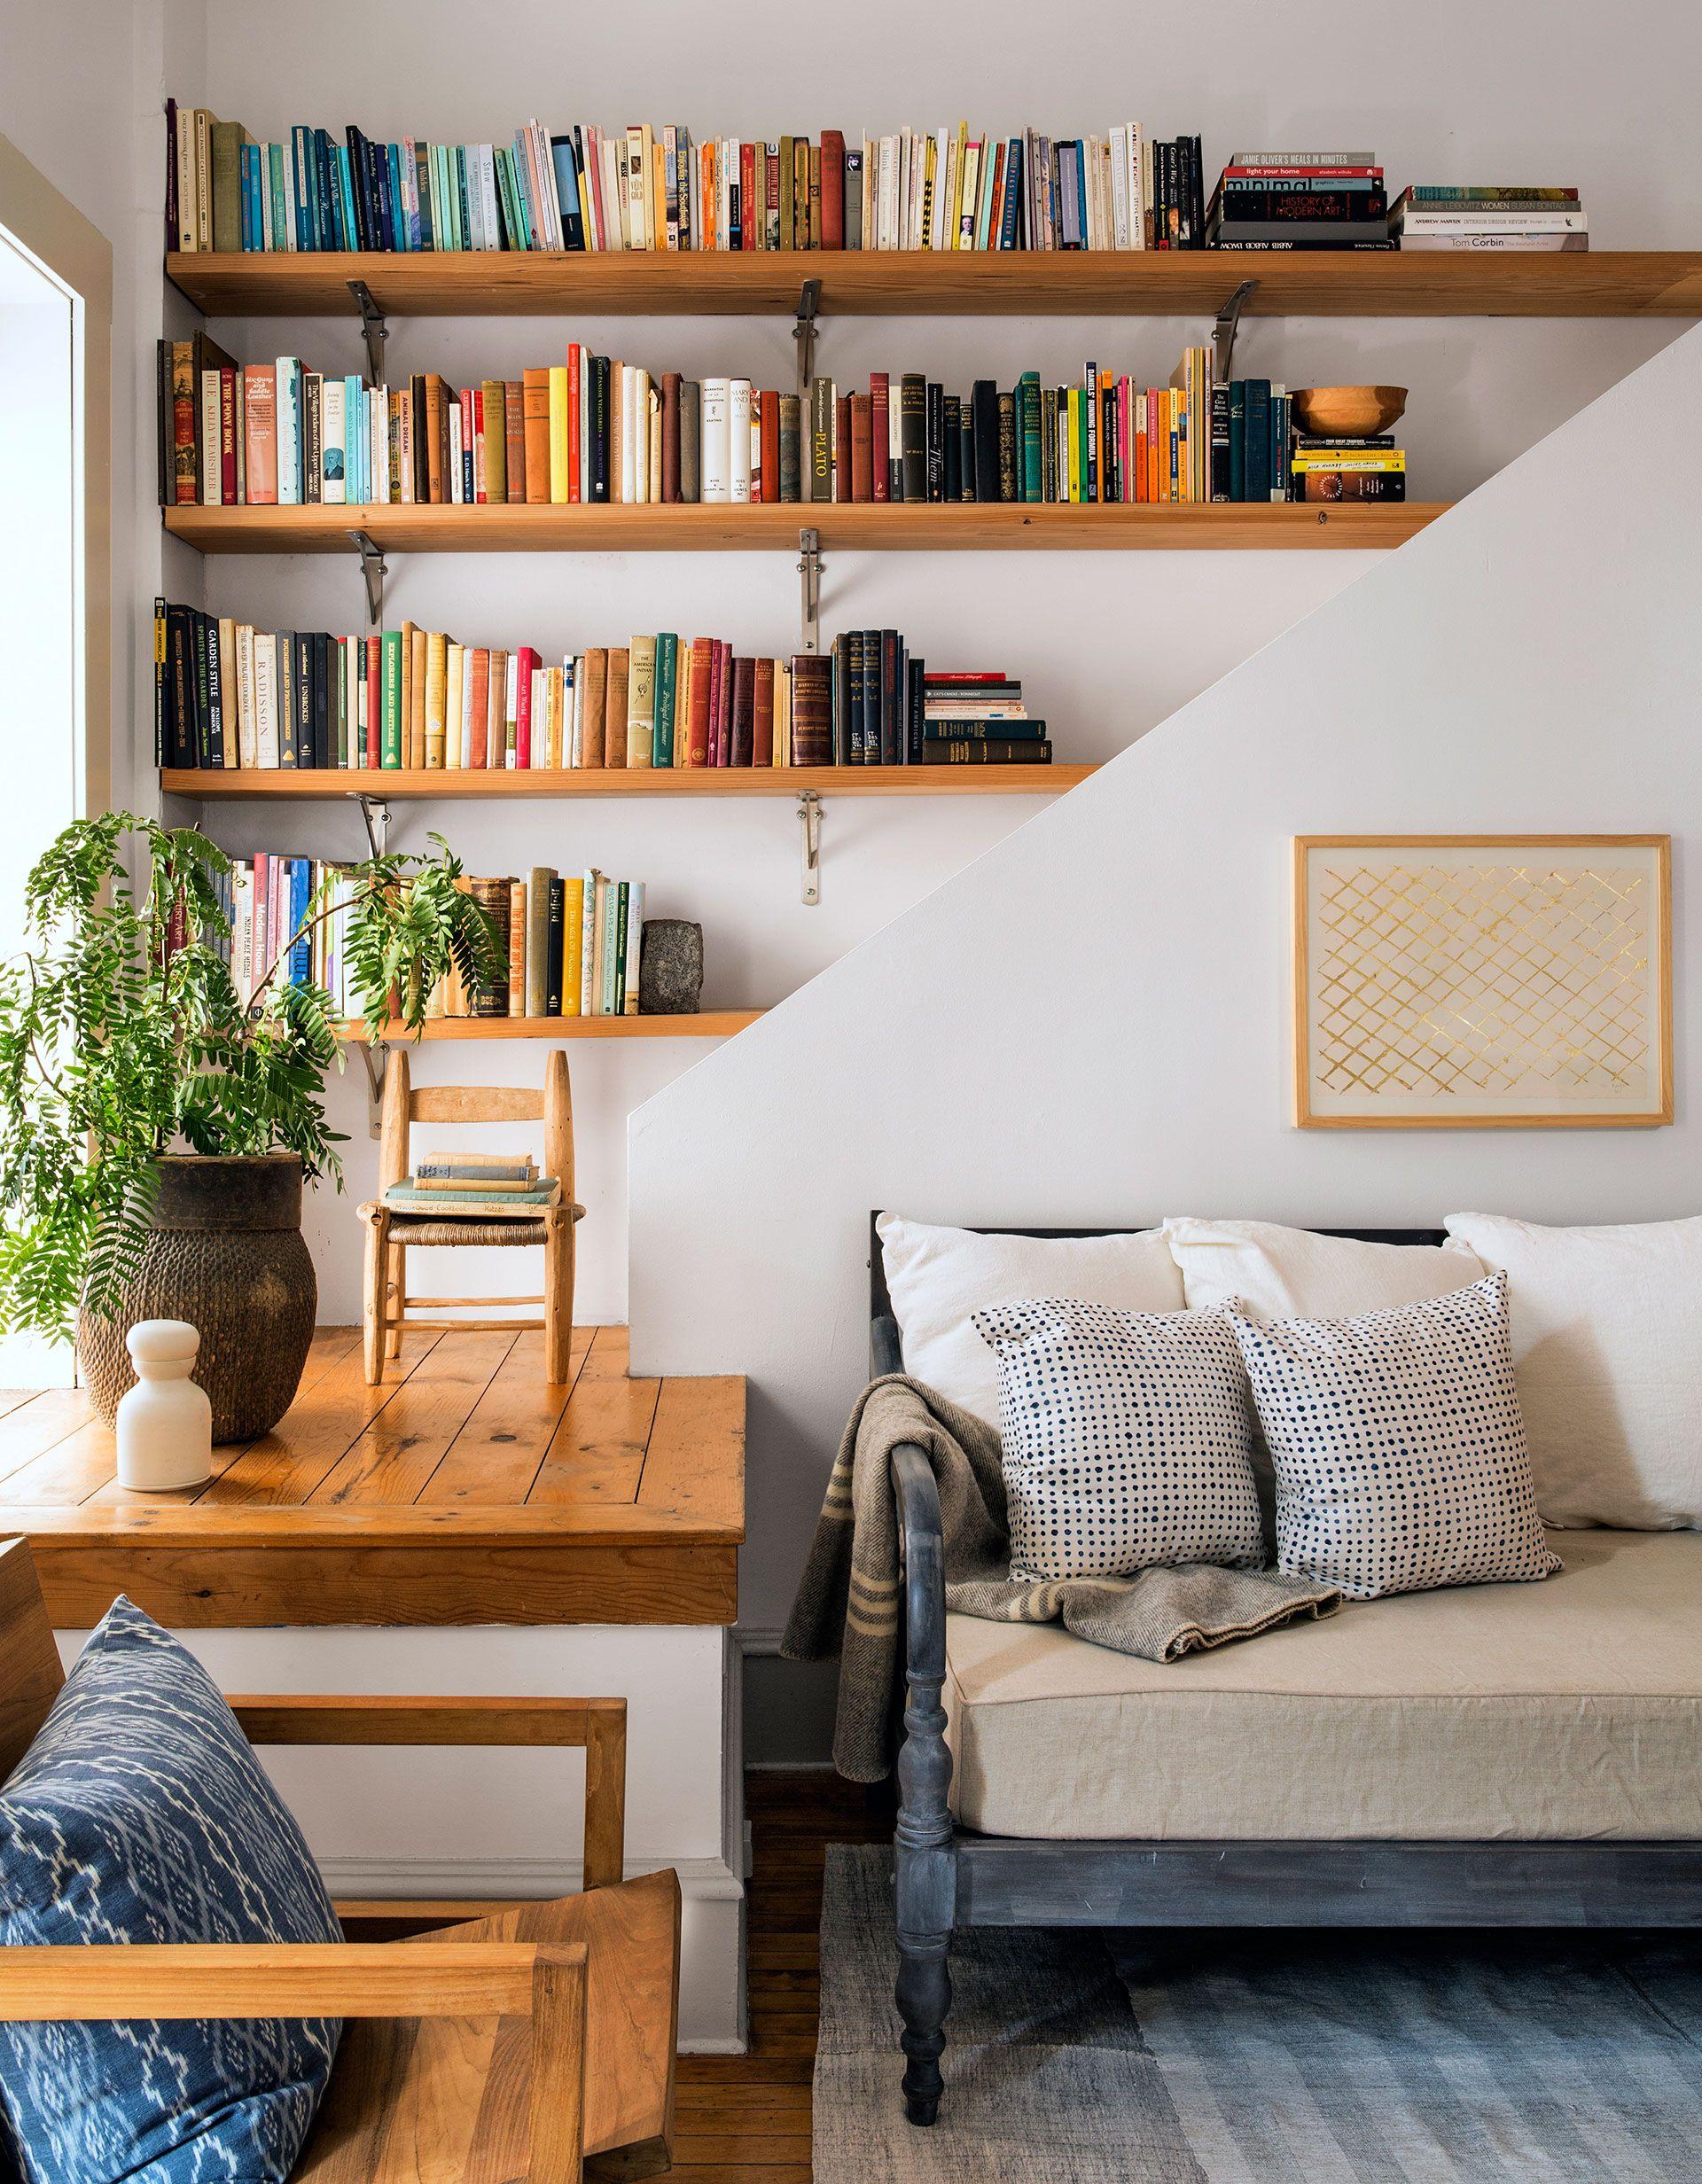 inspiring home interior decorating ideas design bookshelves house libraries also rh pinterest